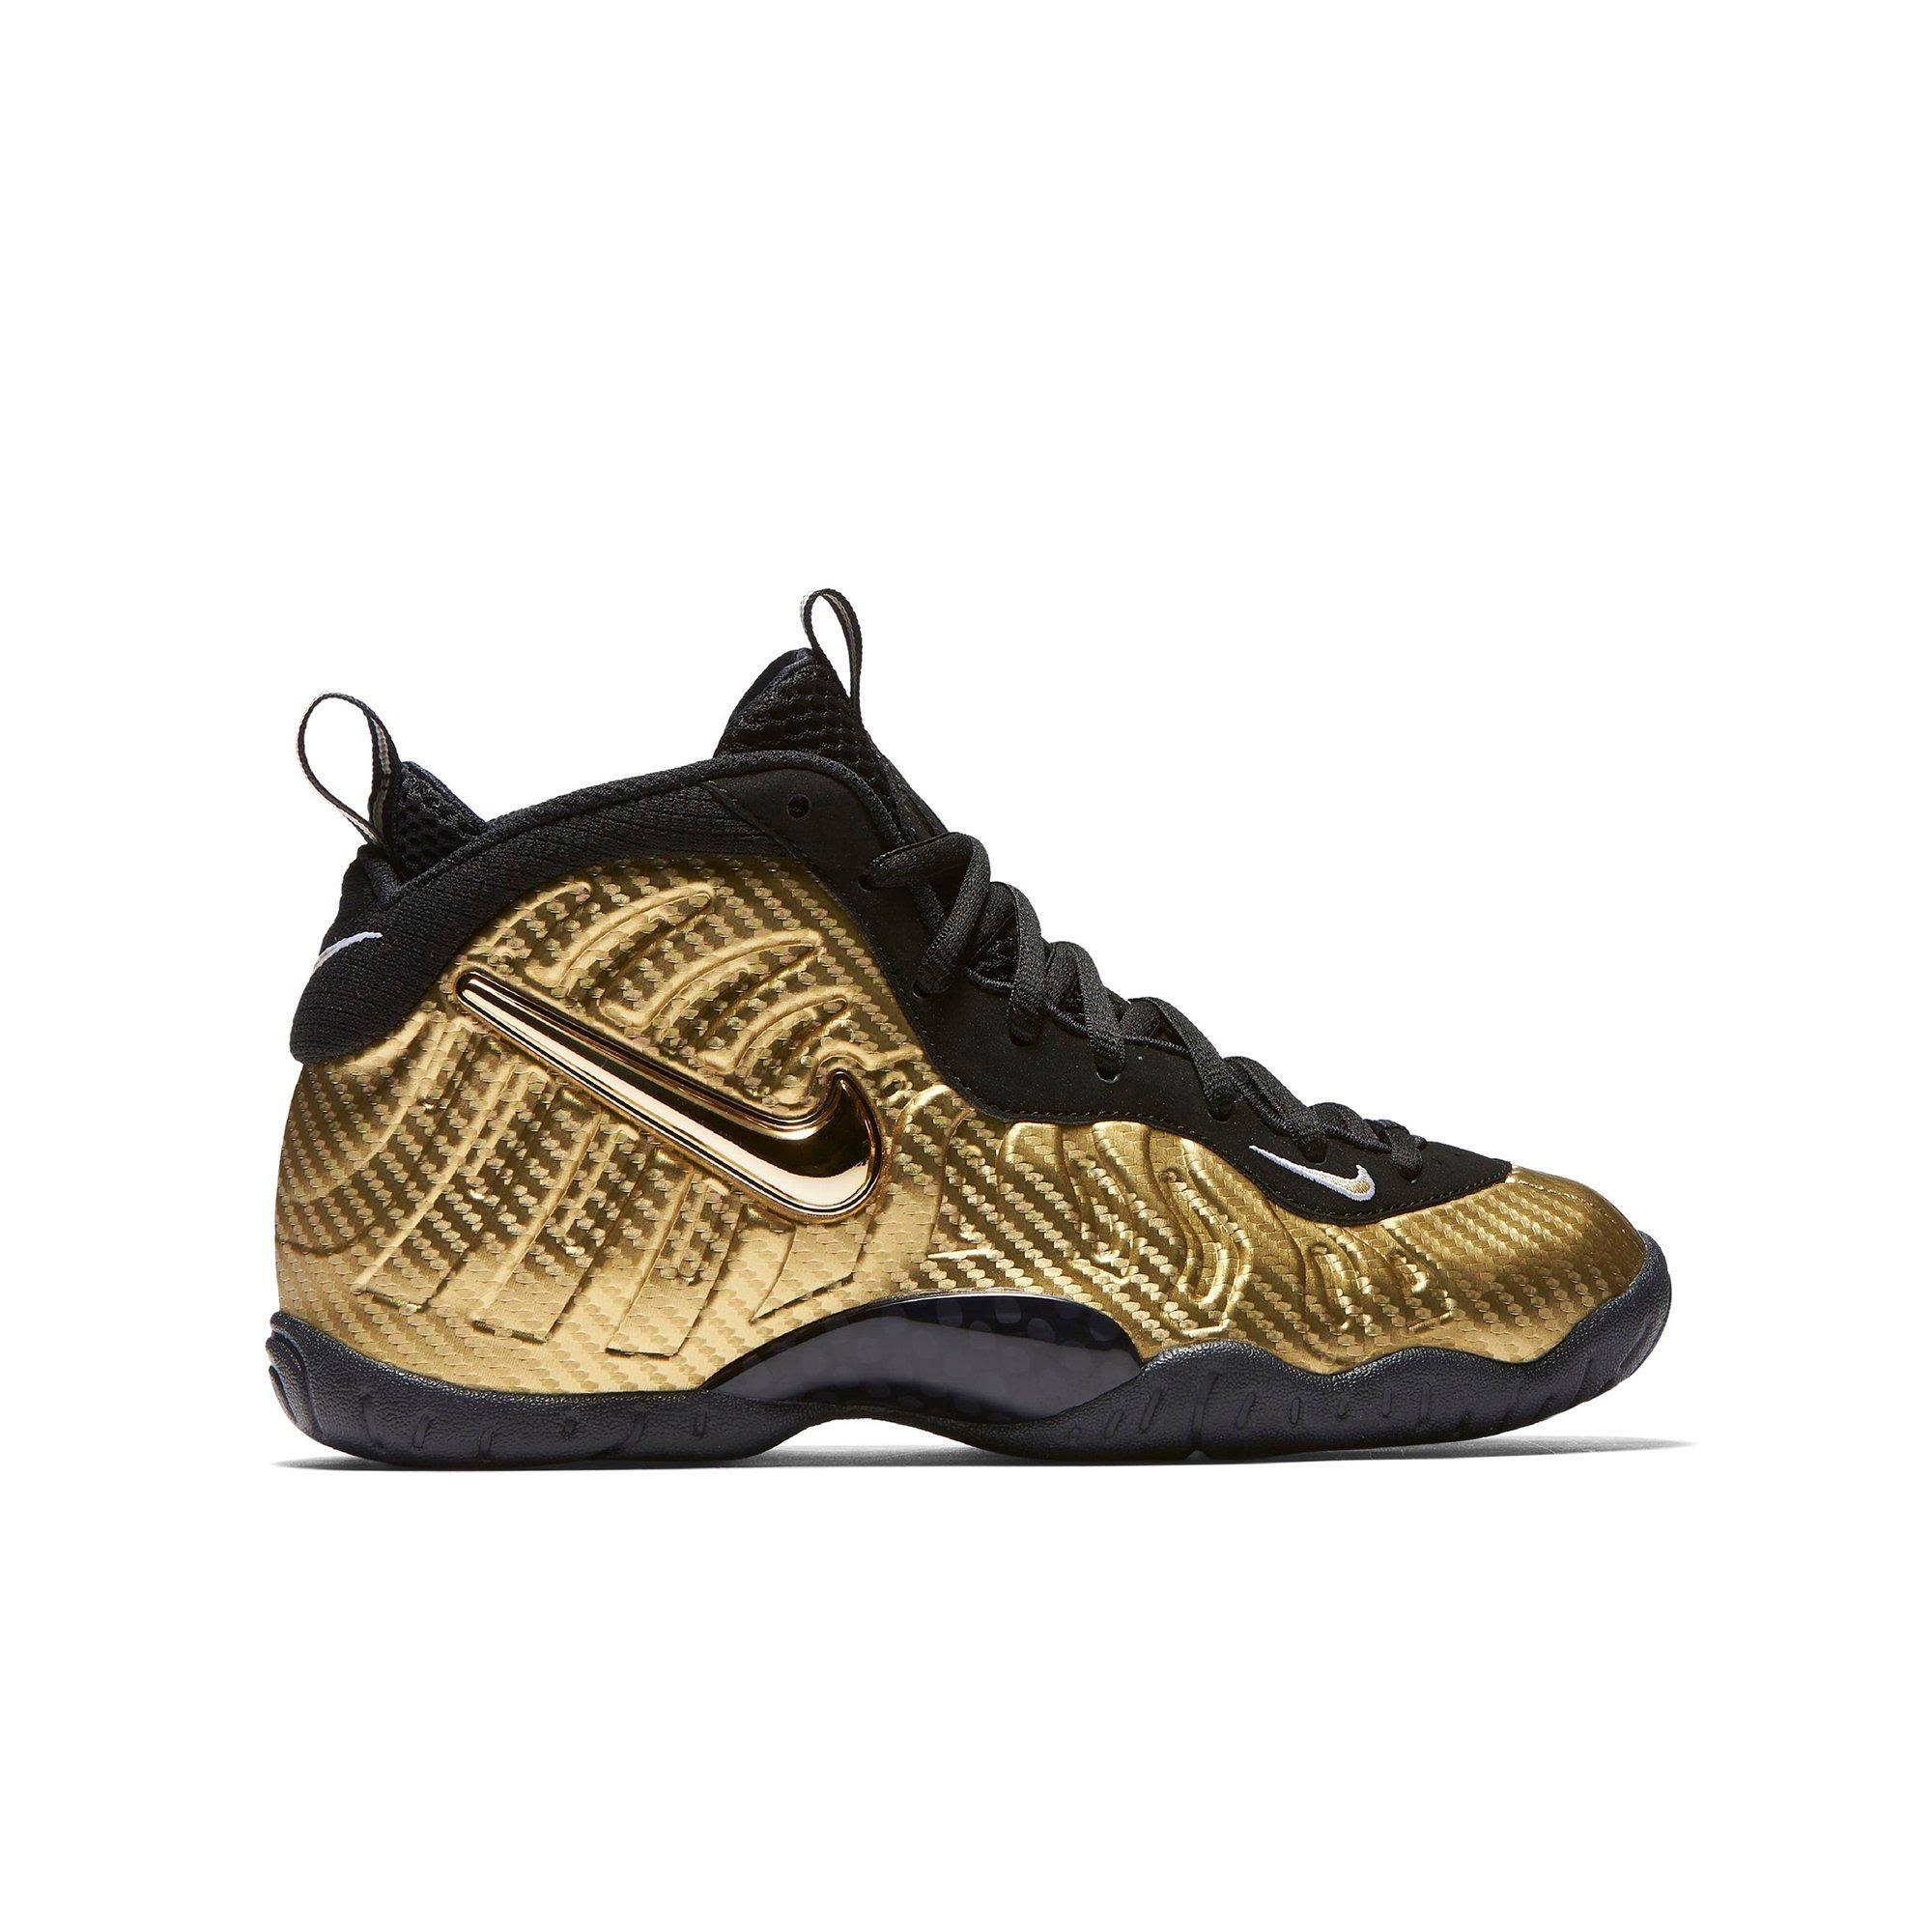 Nike Kinderschuhgröße Pro Little 7y Posite gold Big rw7rS4